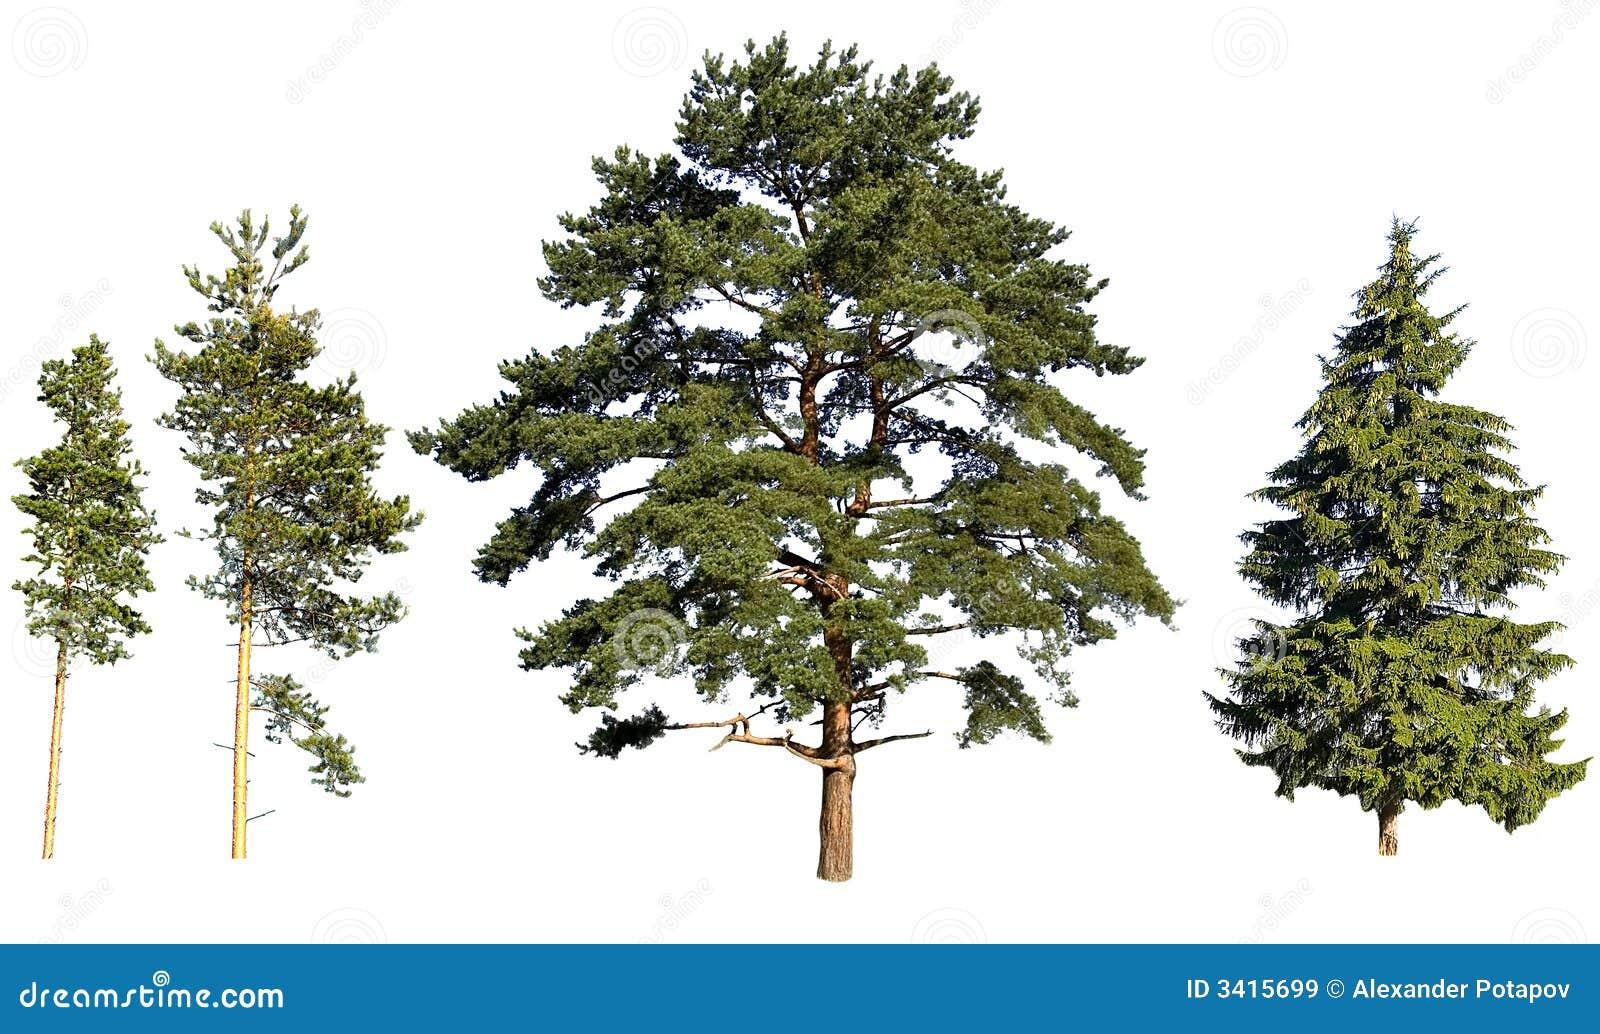 pins et sapin d 39 arbre images libres de droits image 3415699. Black Bedroom Furniture Sets. Home Design Ideas